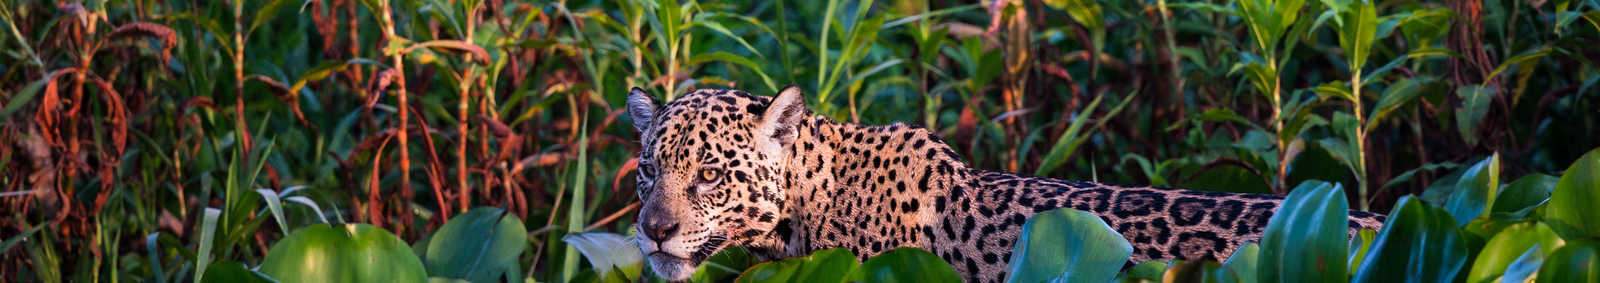 Jaguar, Pantanal, Brazil - Copywrite Paul Goldstein